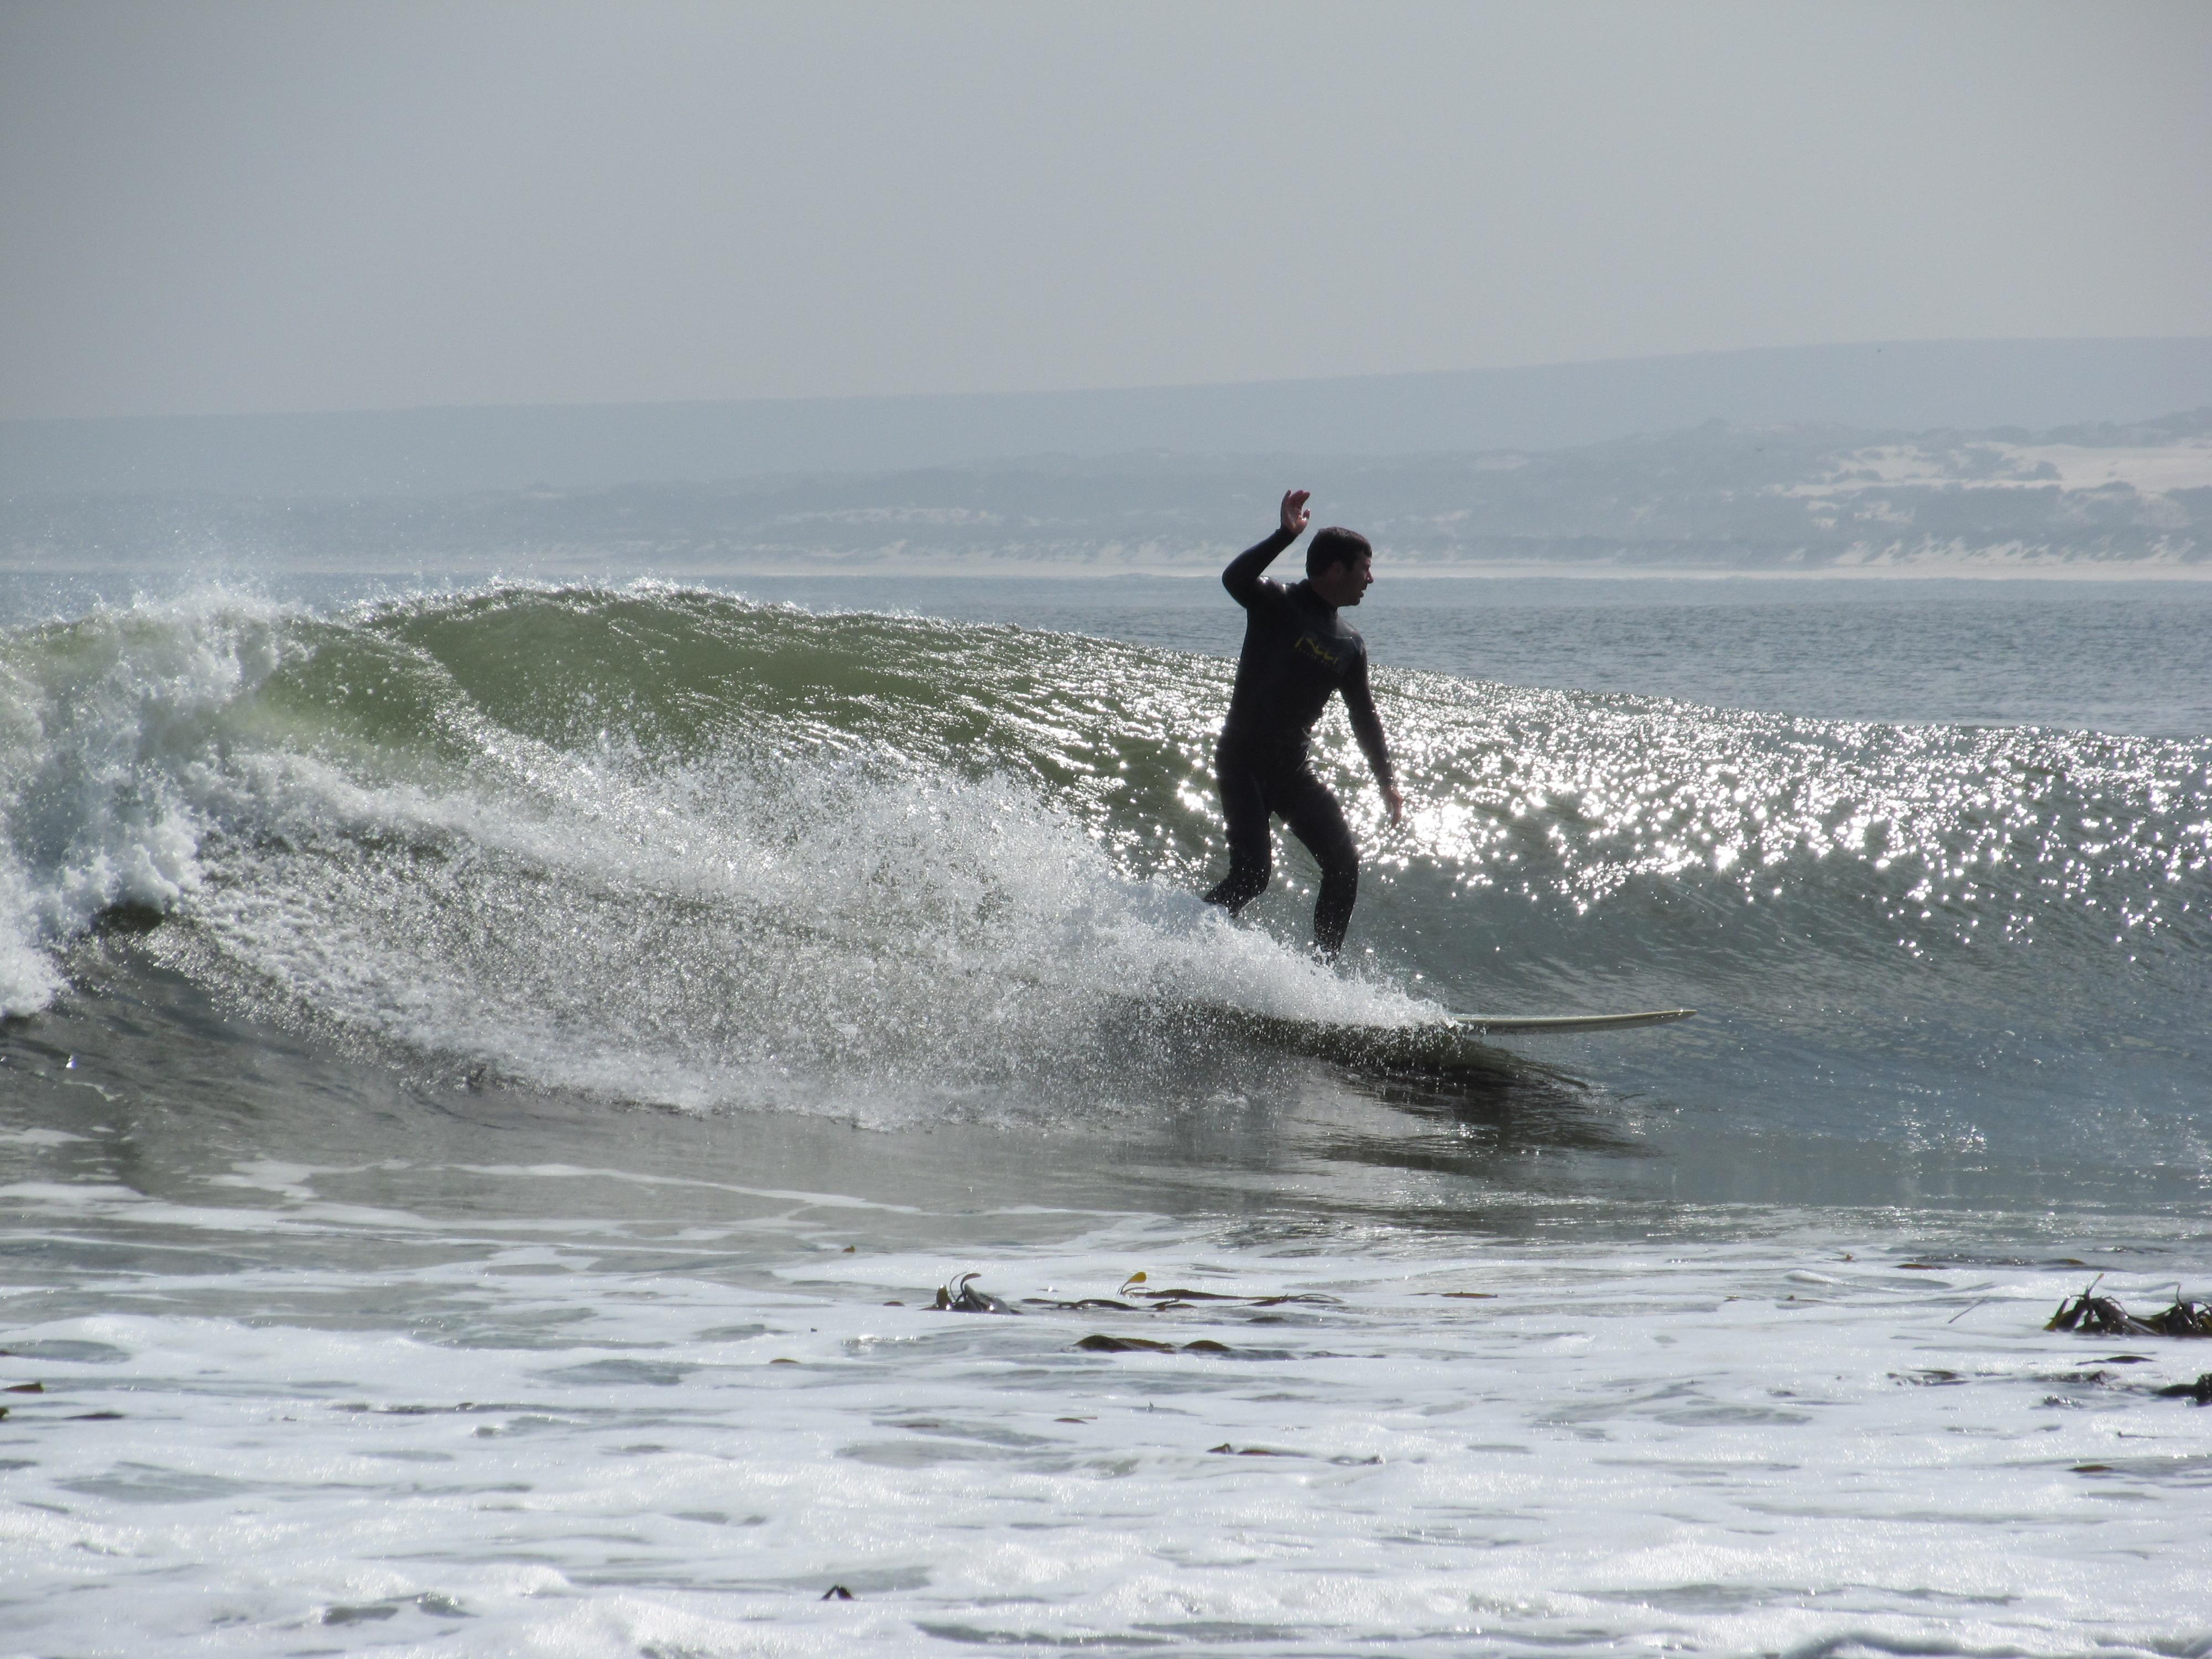 Surfing the Atlantic